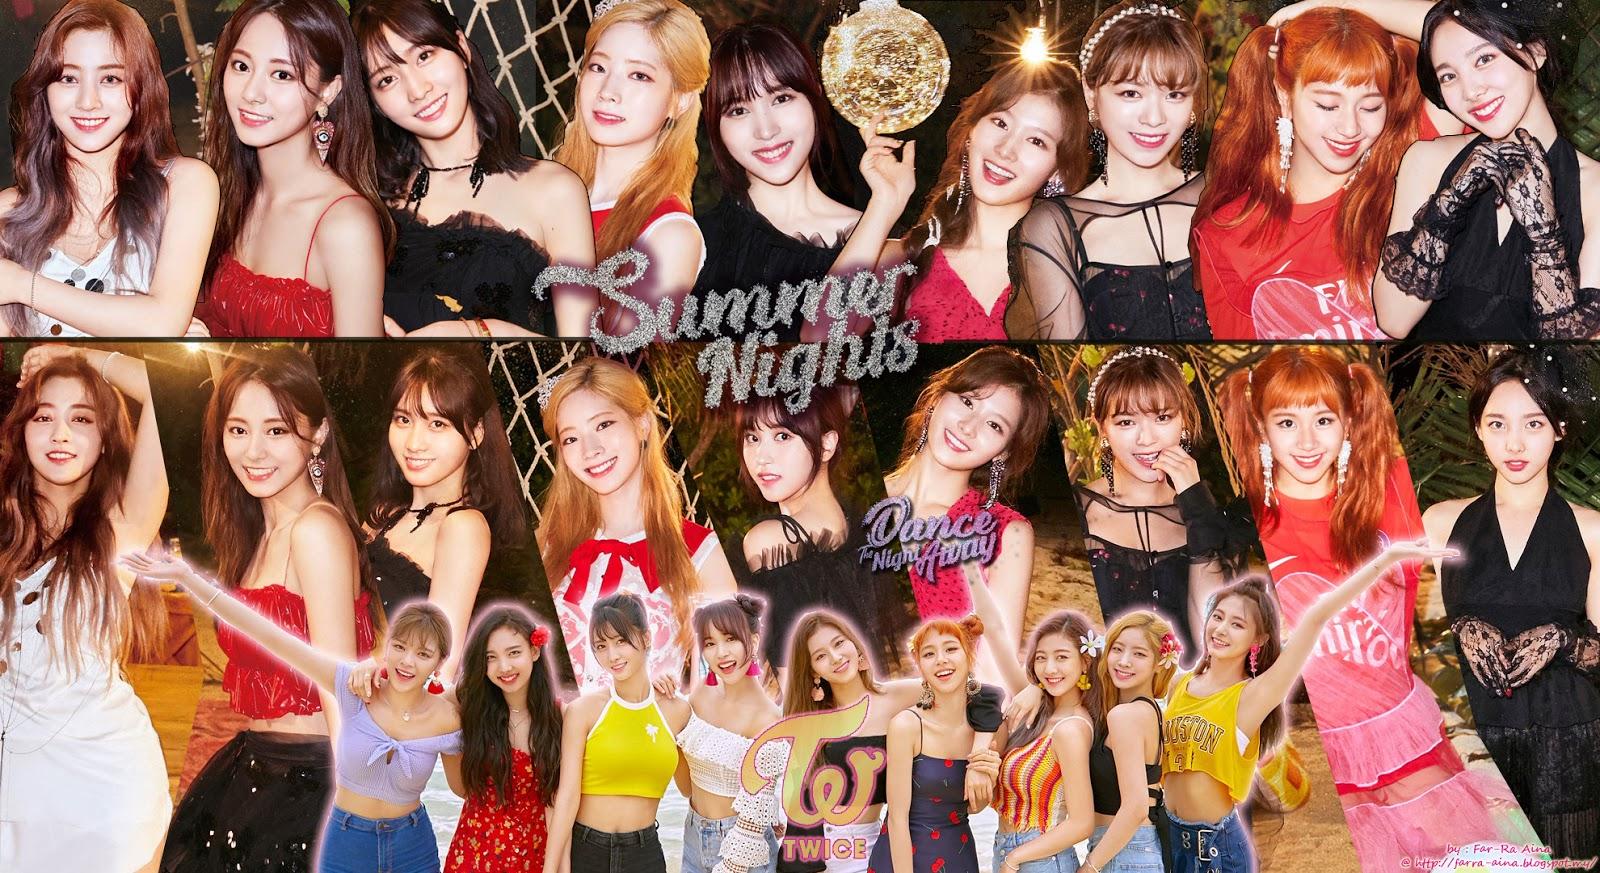 K Pop Lover Twice Summer Nights Wallpaper